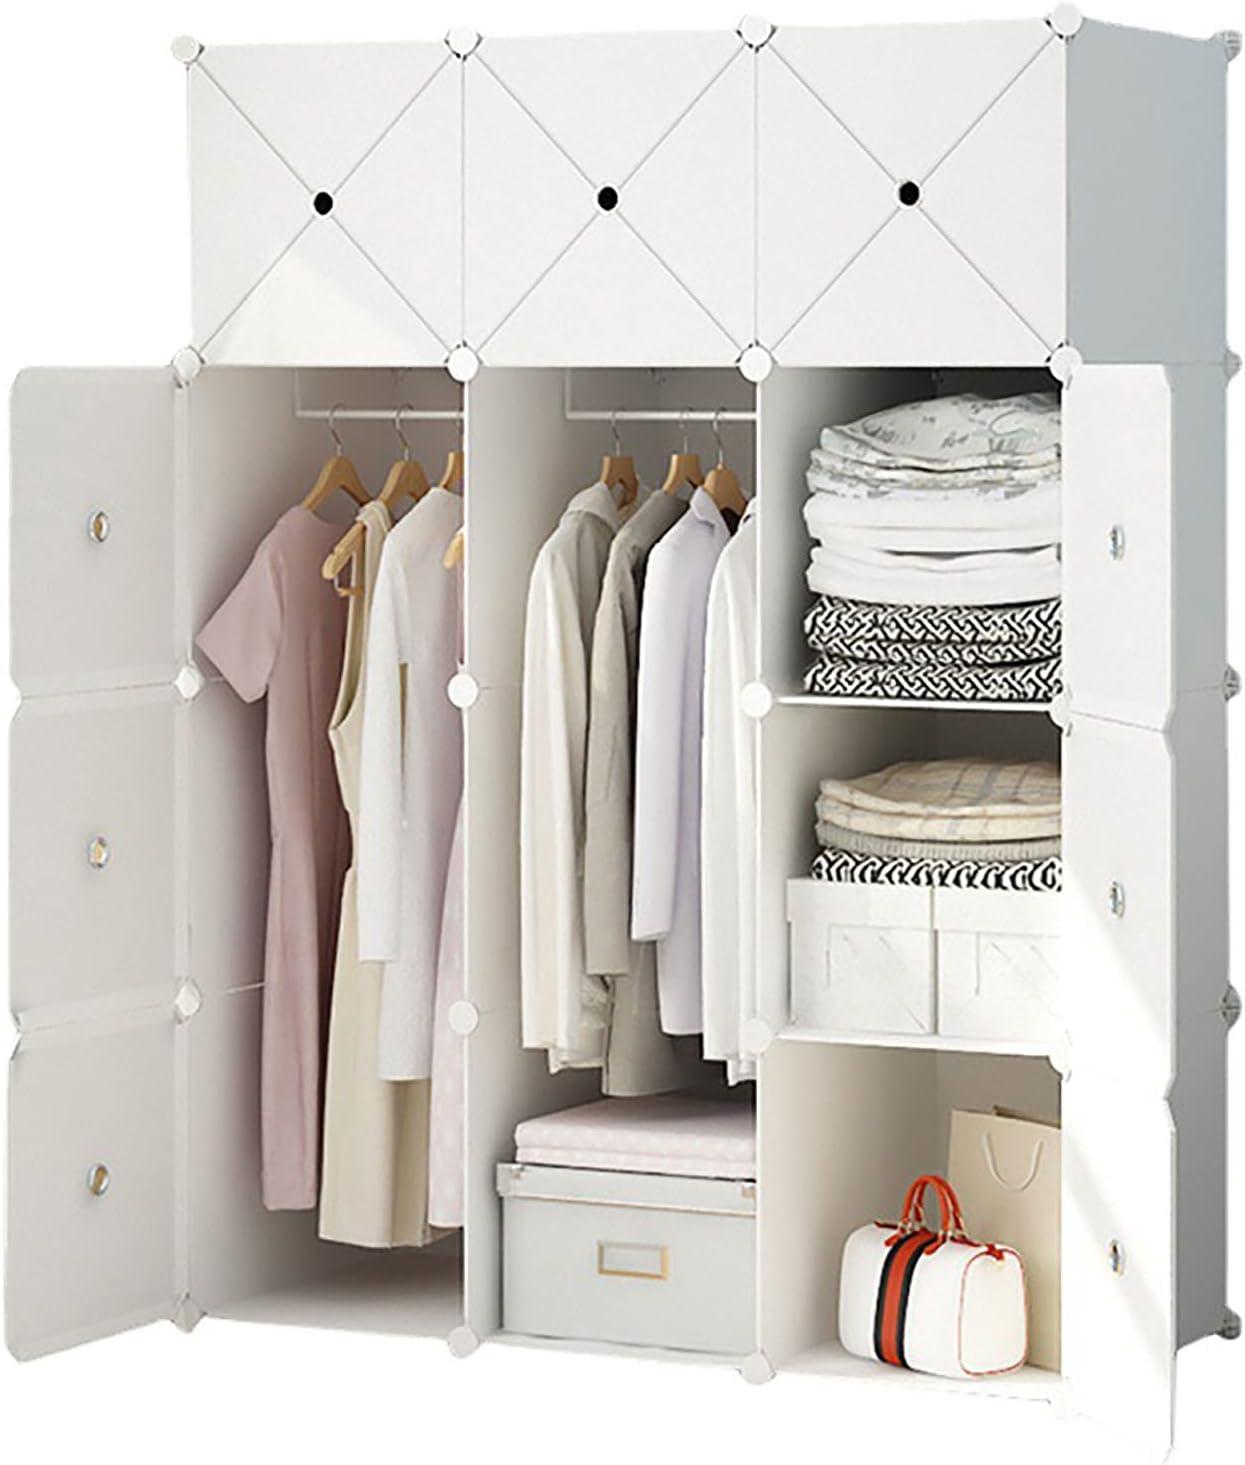 Max 77% OFF GFHJHTY Simple discount Wardrobe Detachable Cloth As Dormitory